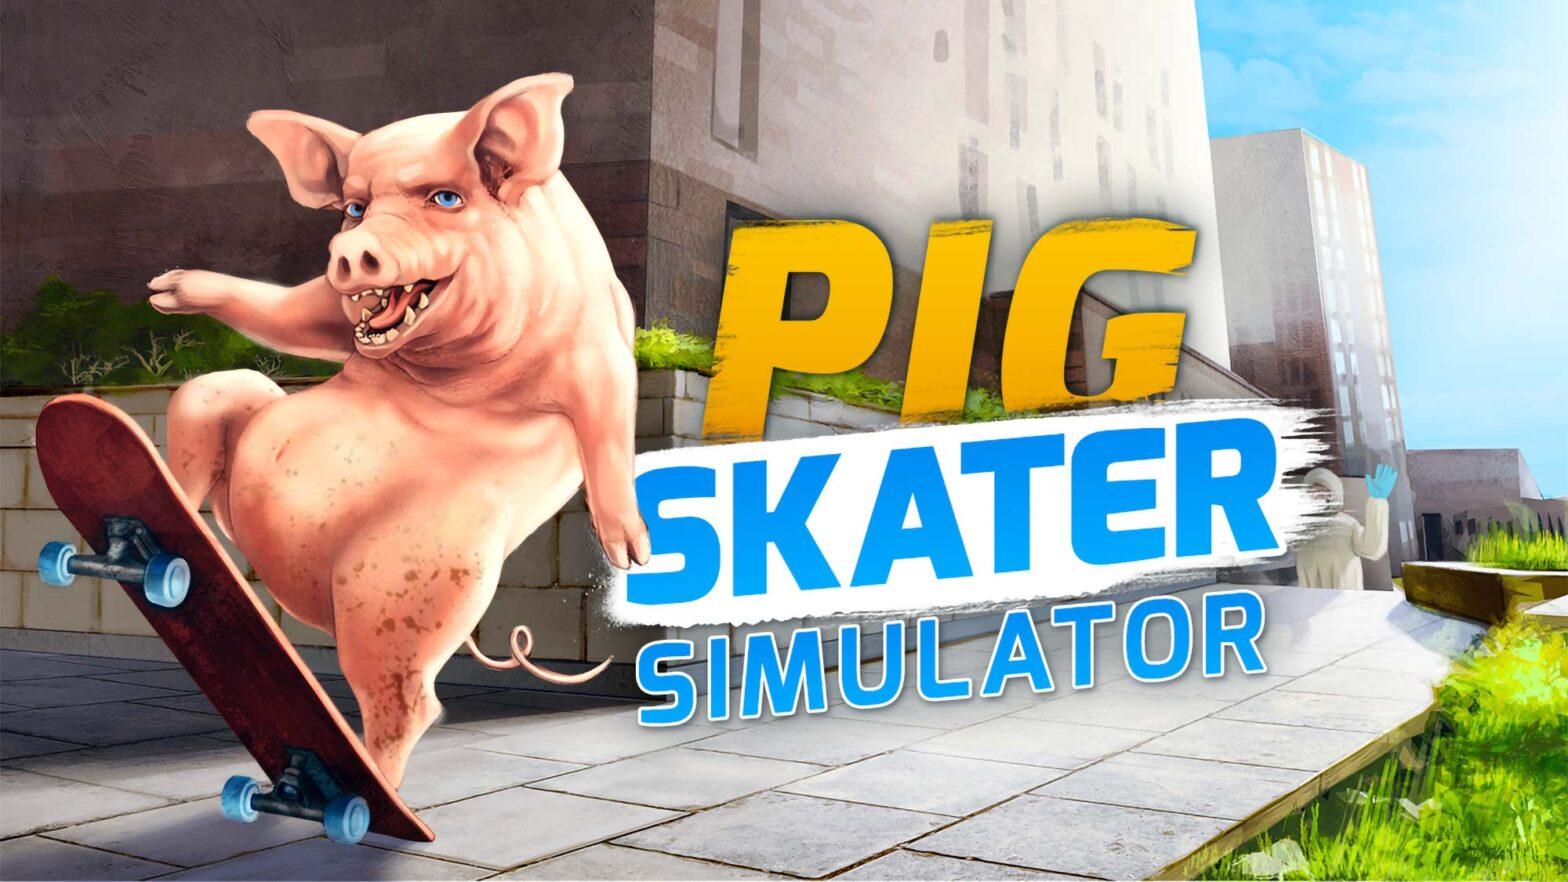 Pig Skater Simulator PC Video Game